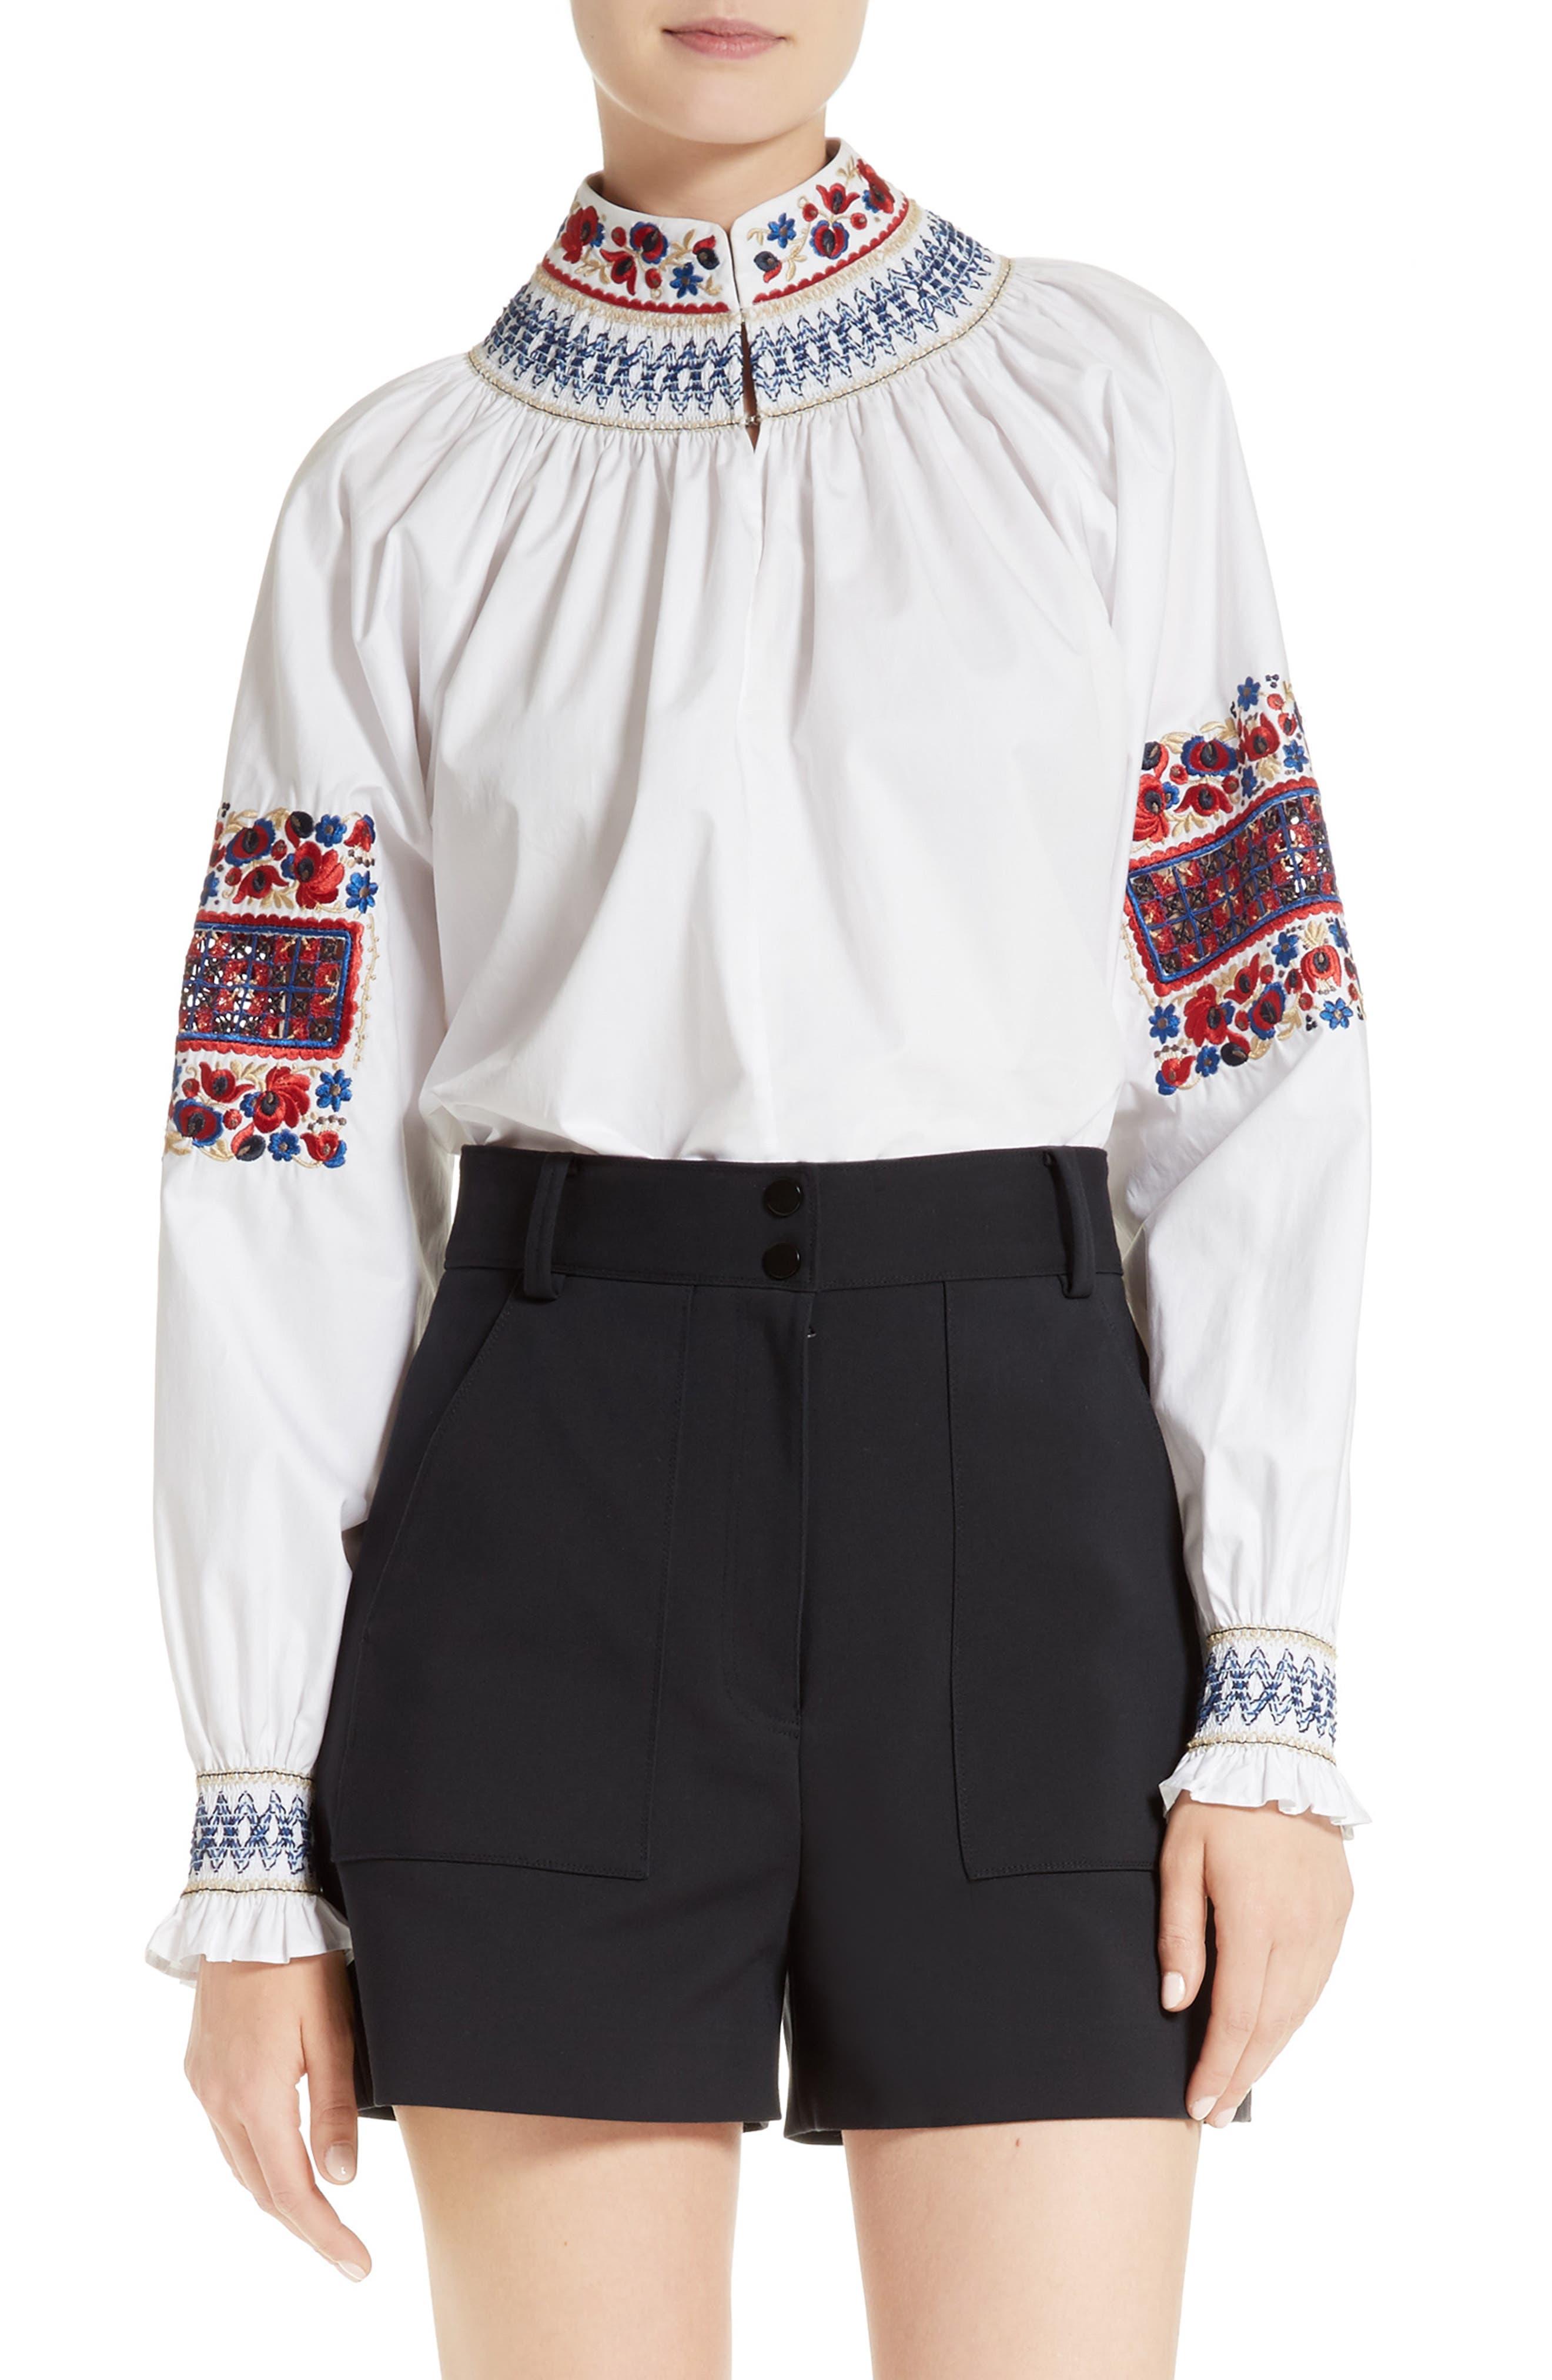 Tibi Cora Embroidered Top